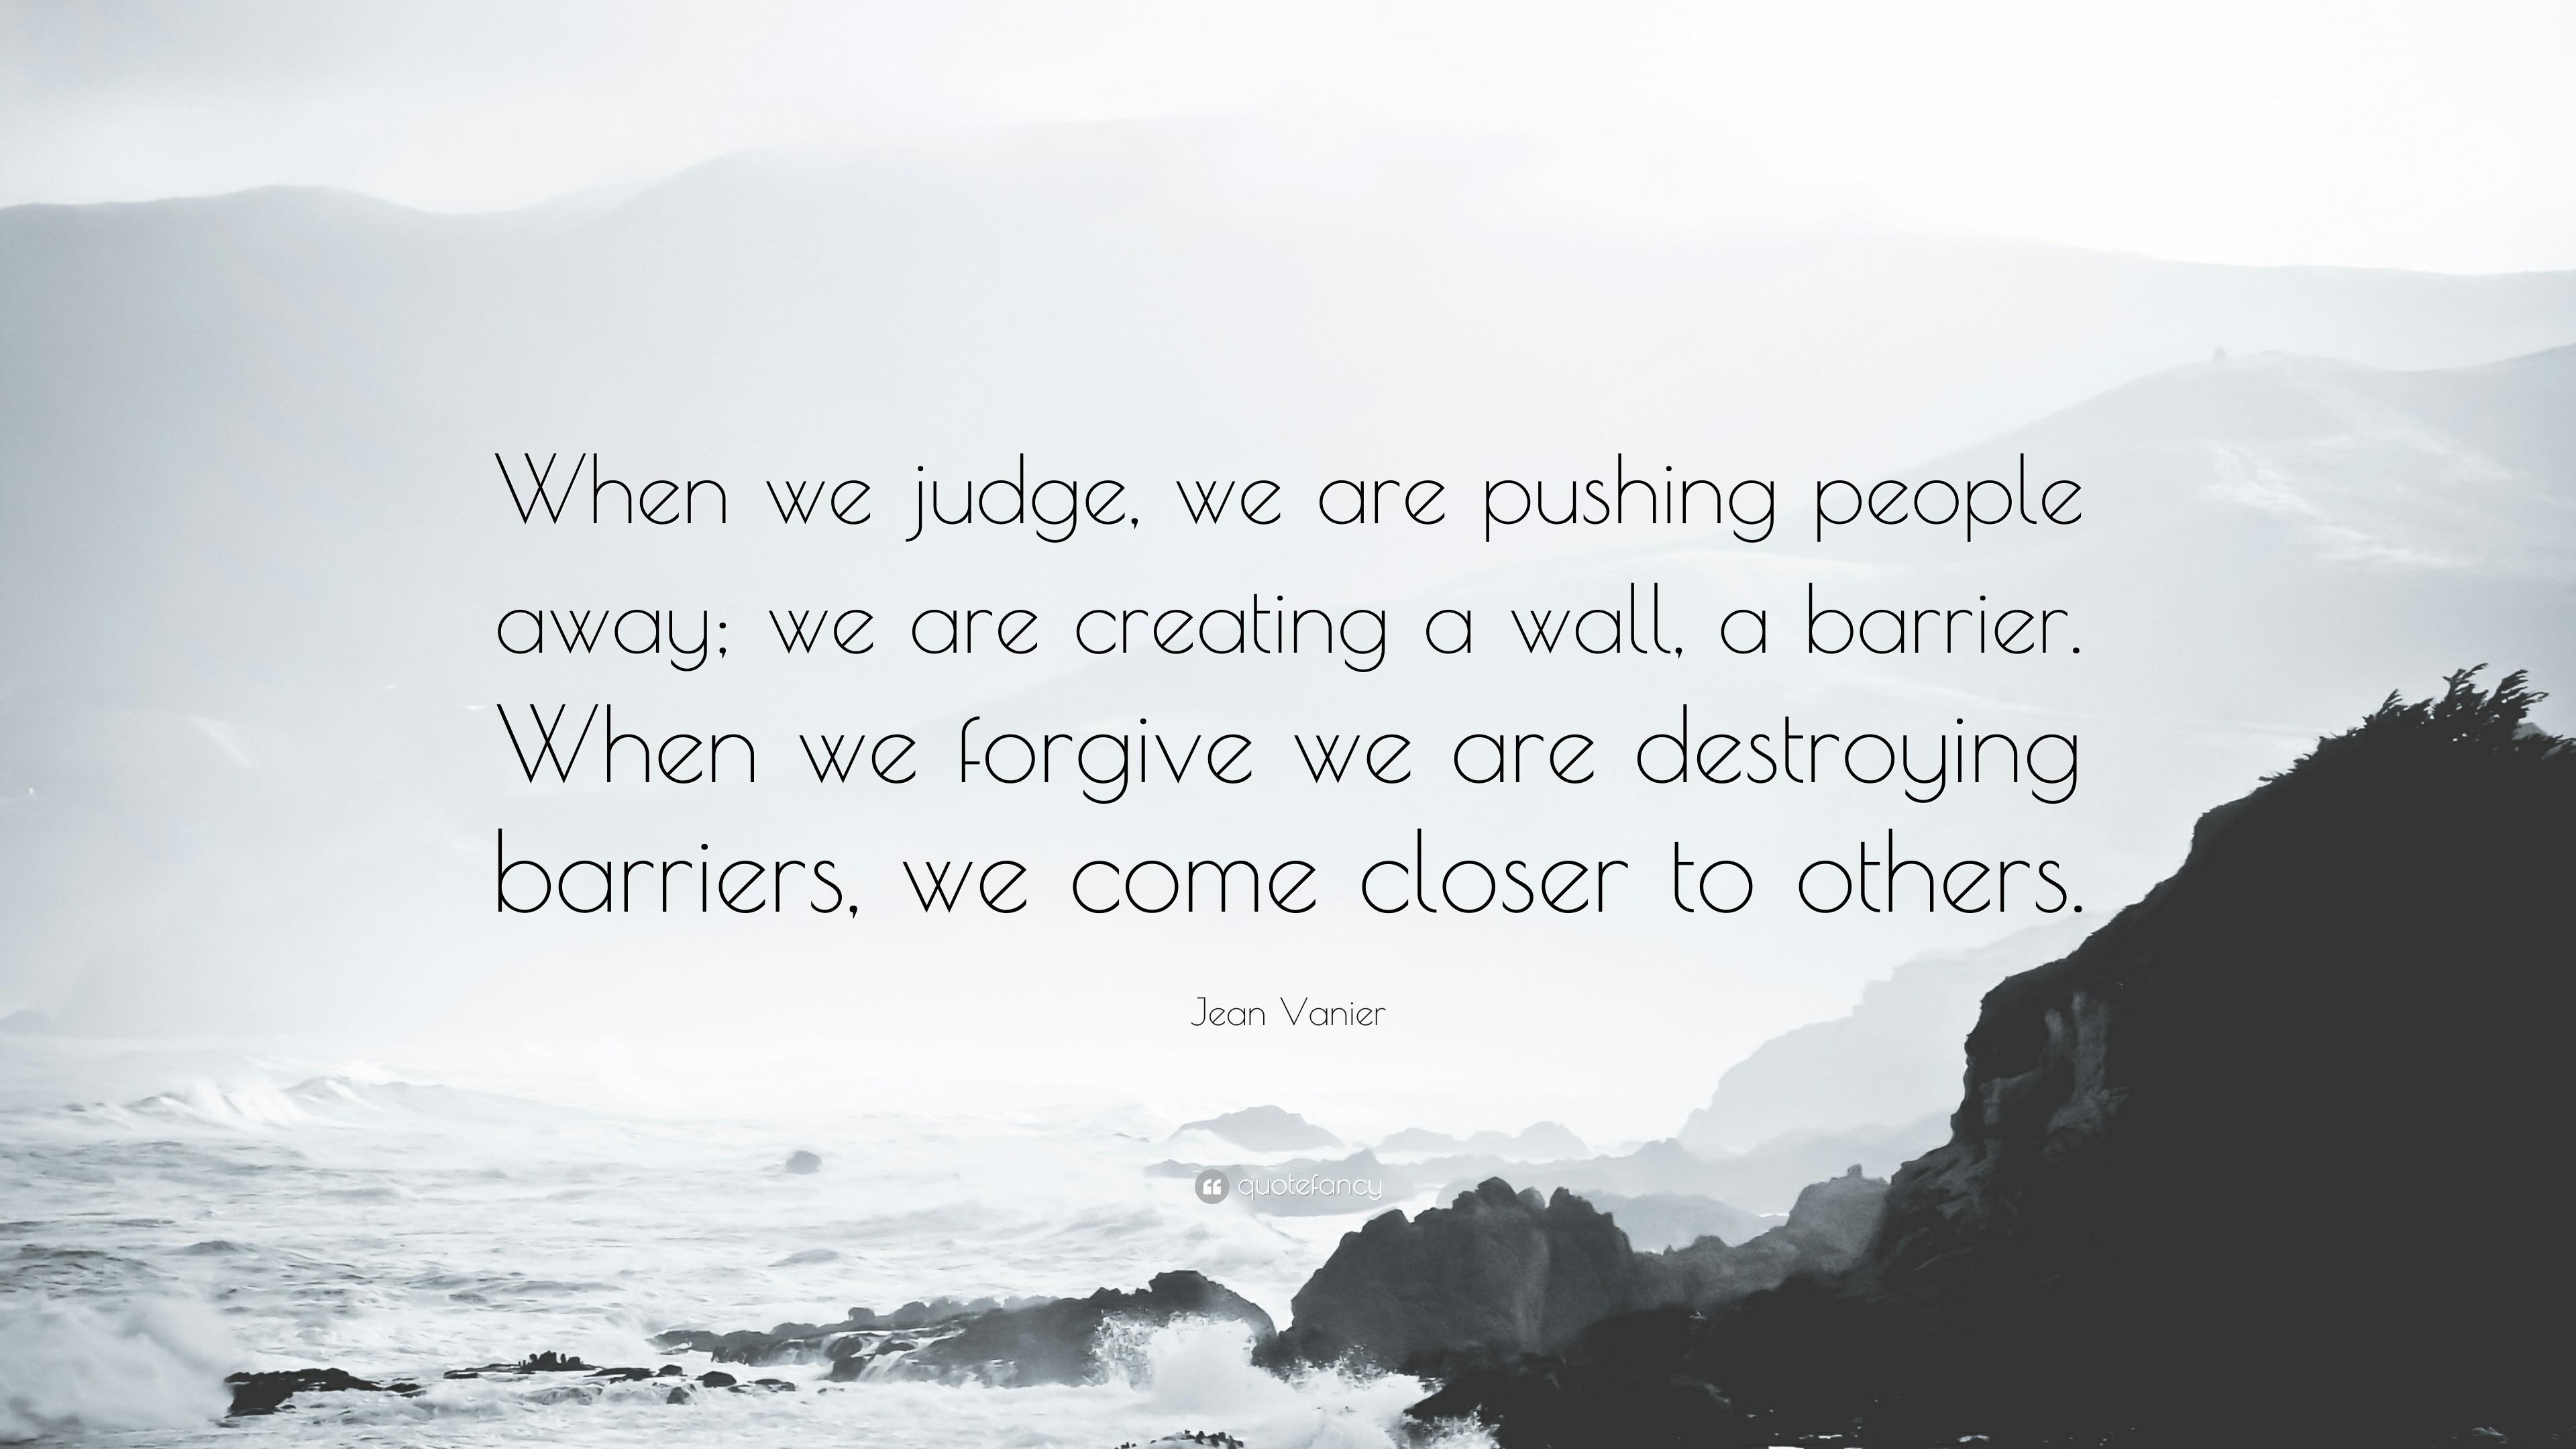 Pushing people away quotes